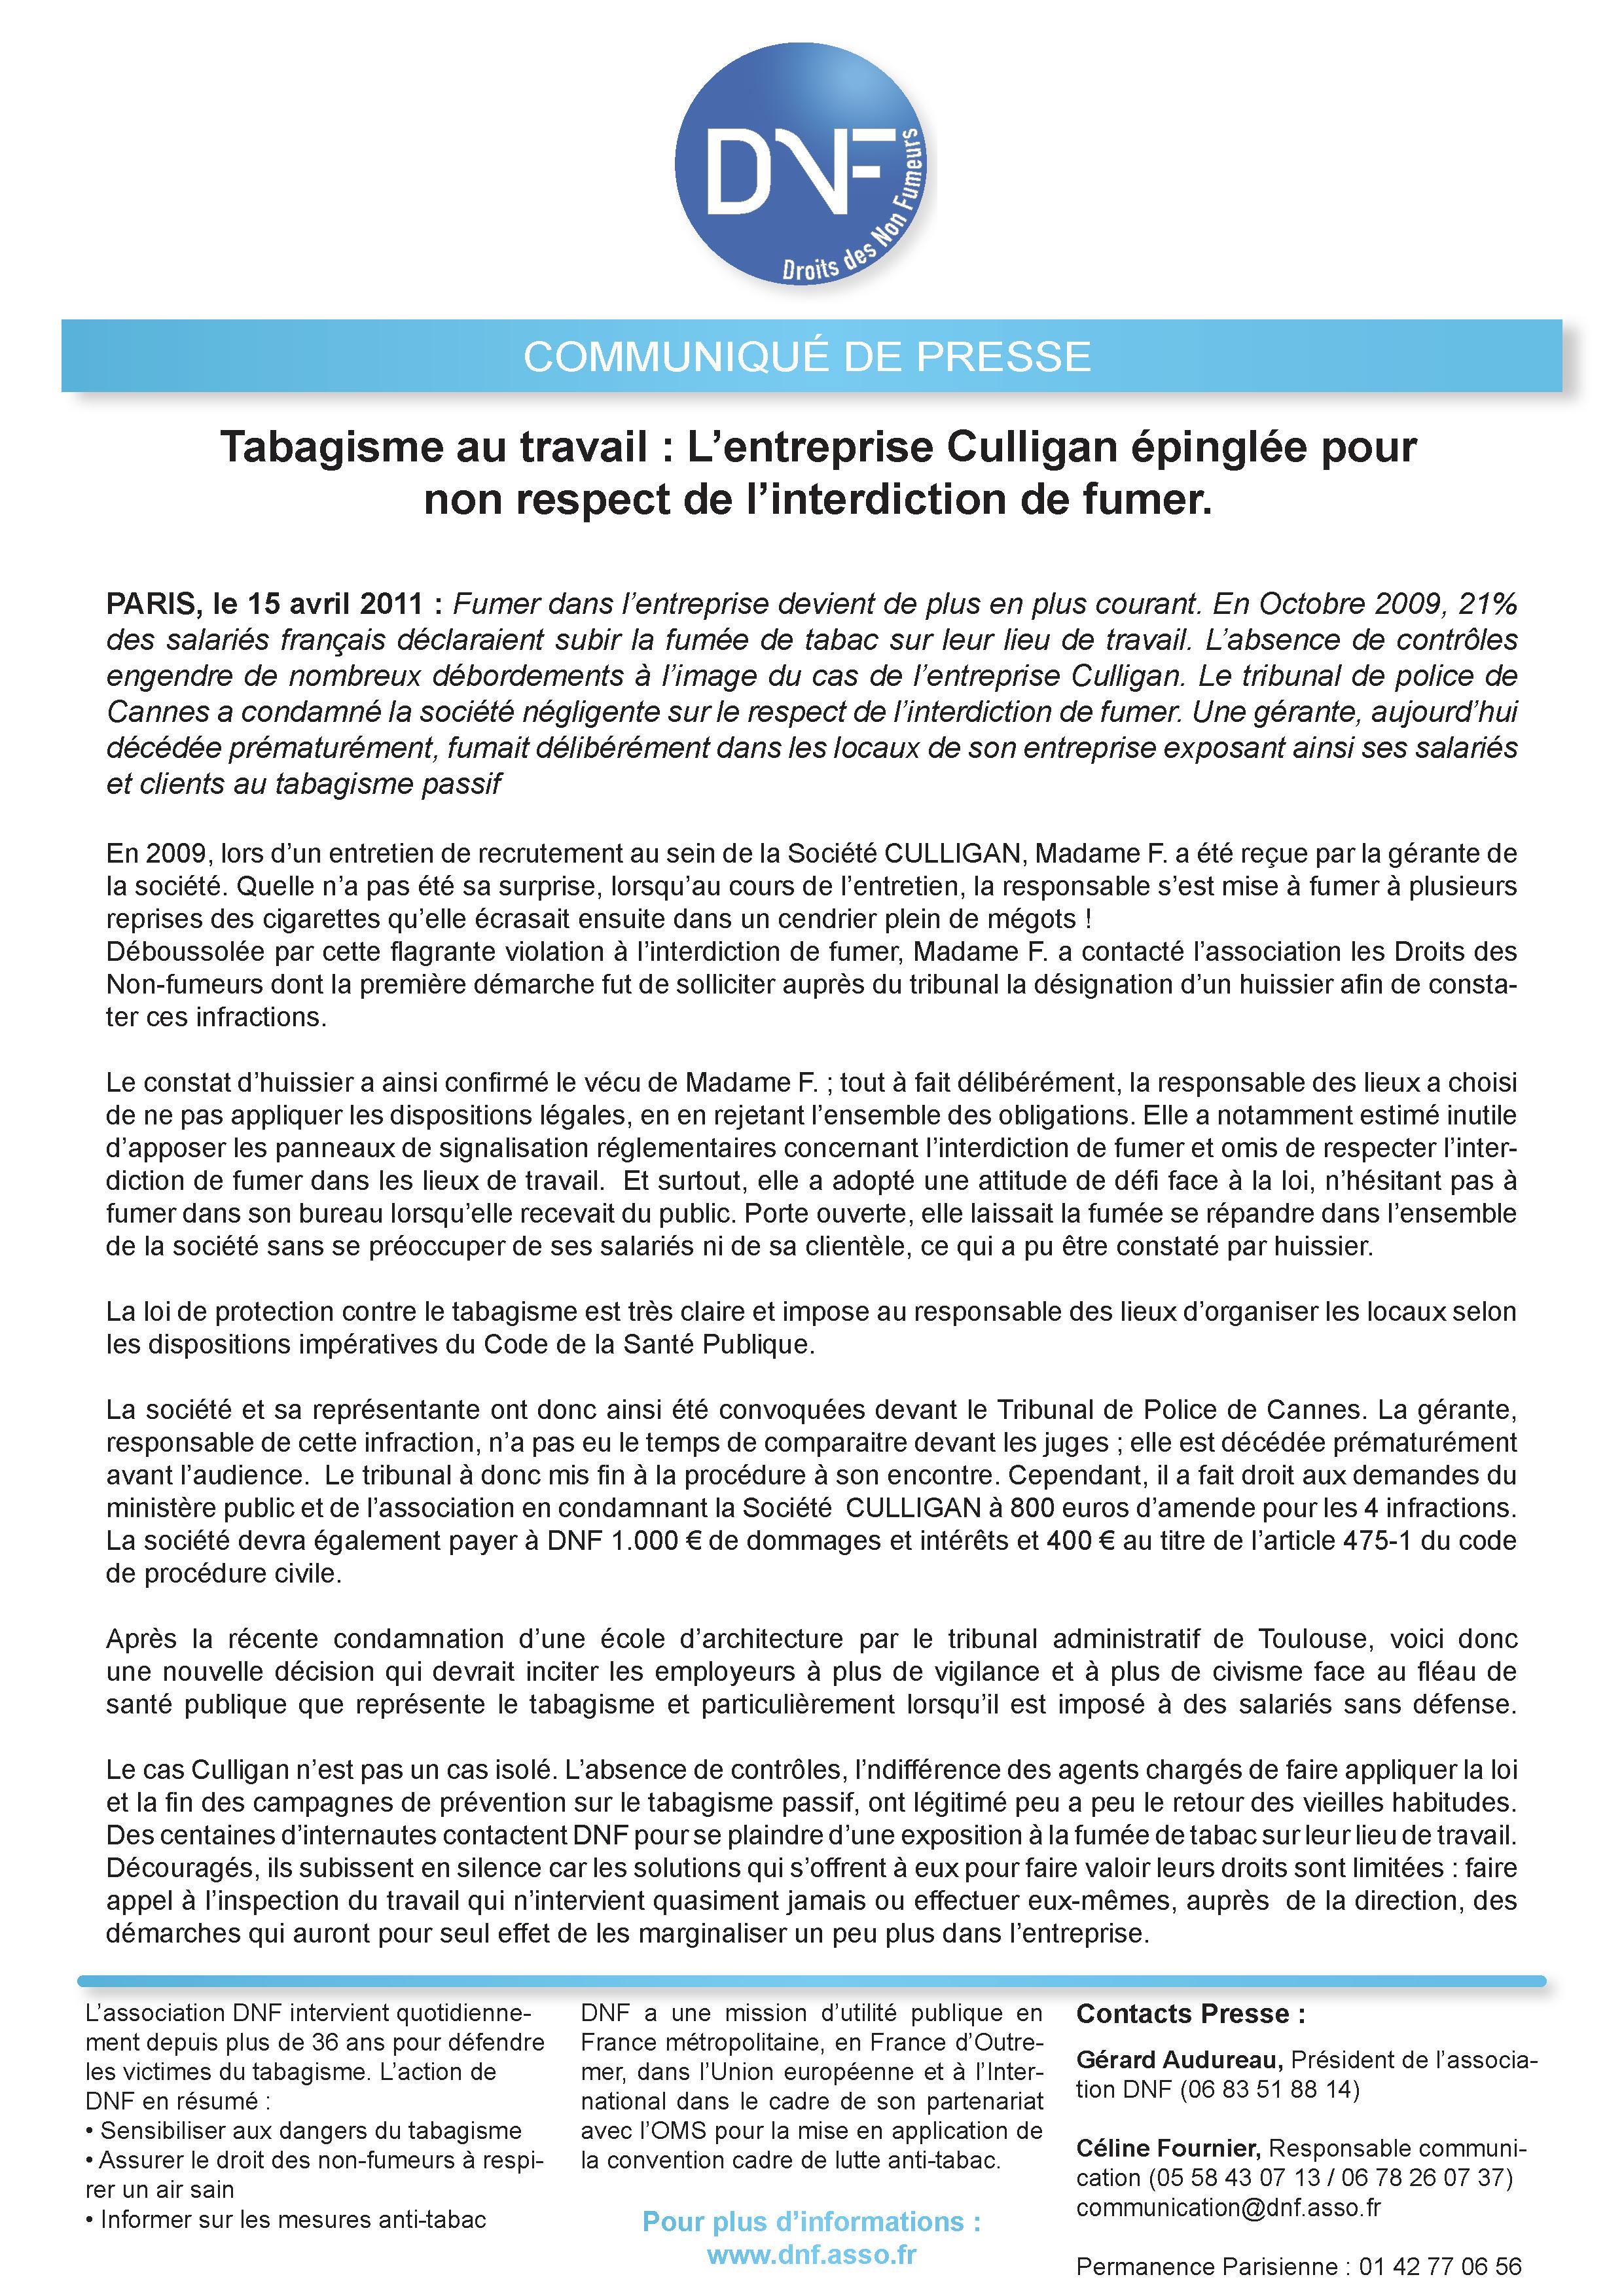 DNF-CP_tabagisme-au-travail-l-entreprise-culligan-epinglee-15avr2011.jpg